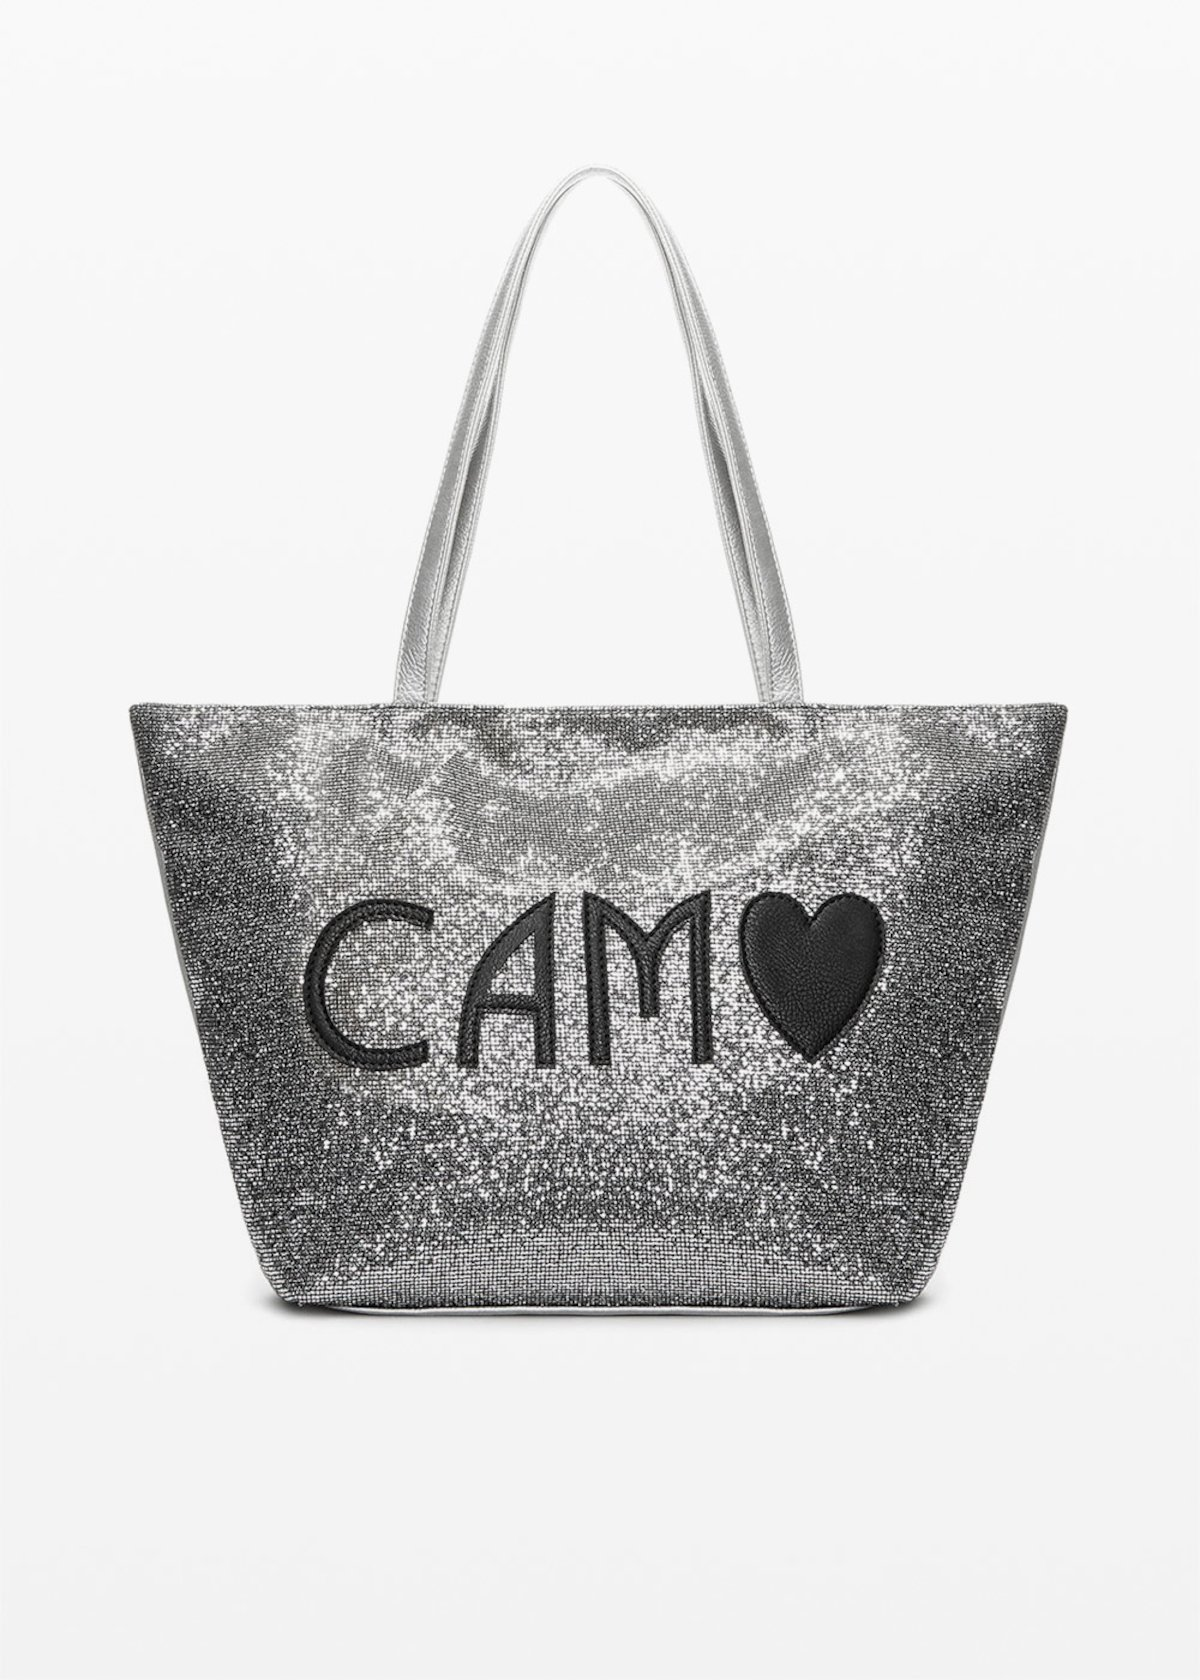 Bondy Shopping bag in sparkling material - Grey_Ocher - Woman